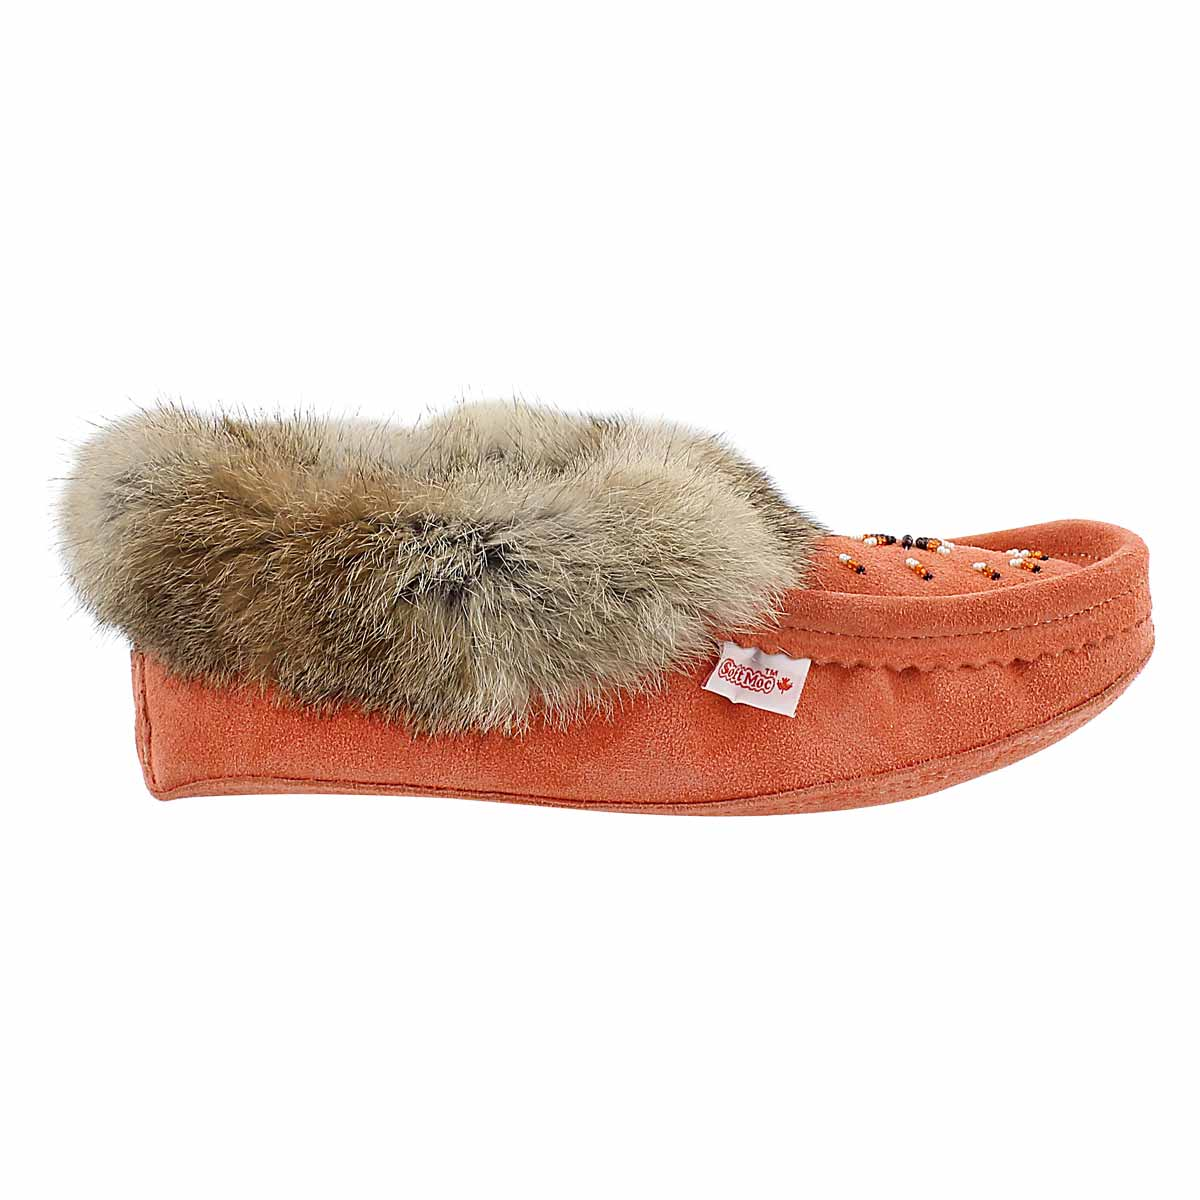 Lds coral rabbit fur moccasin